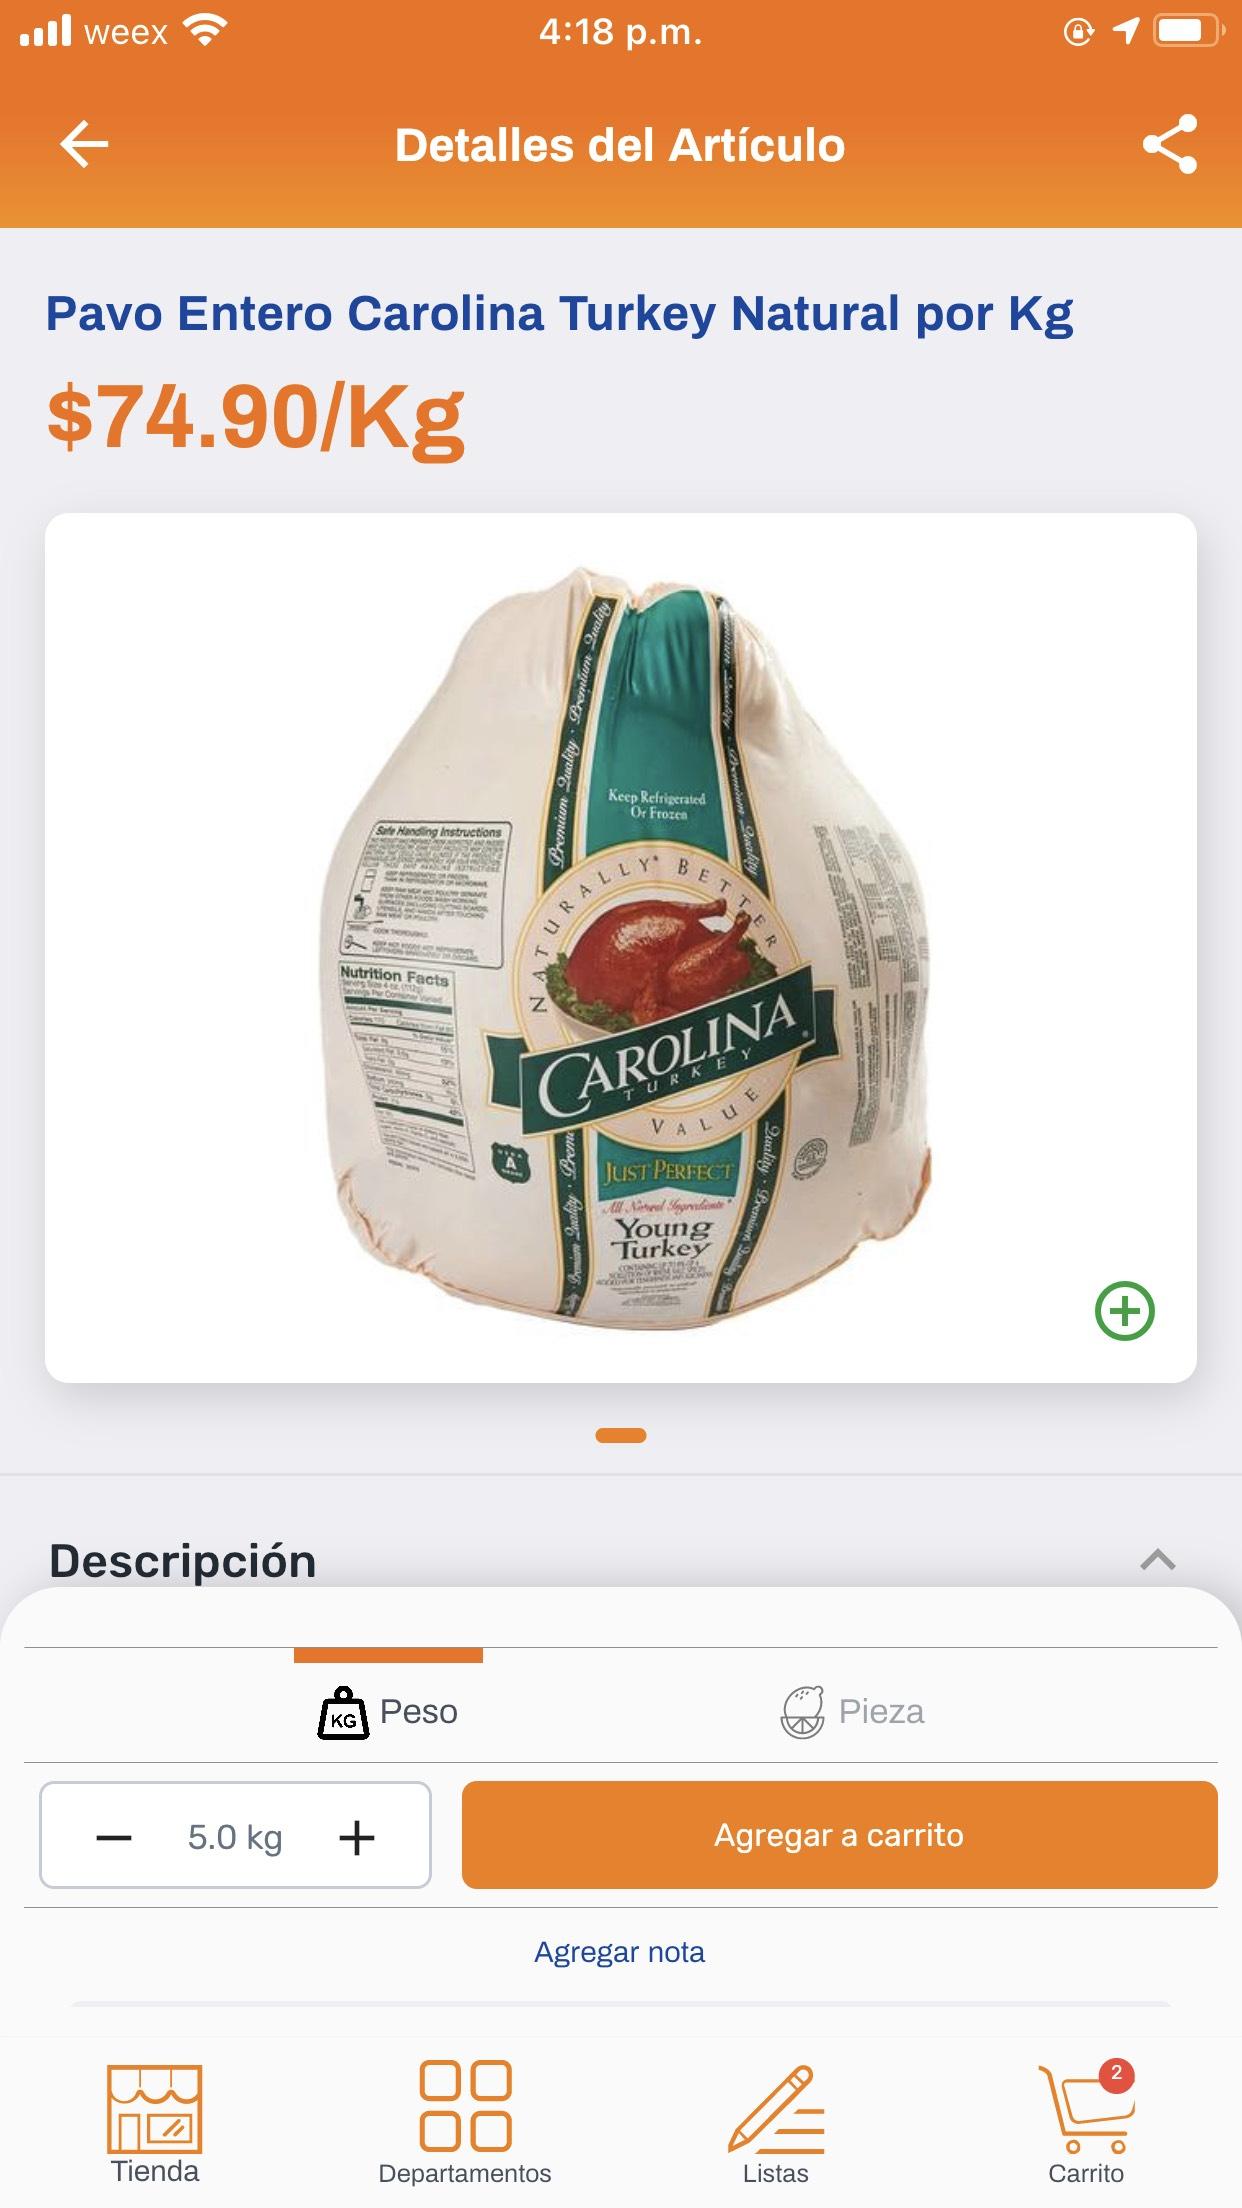 Chedraui: Pavo entero Carolina Turkey Natural por kg.